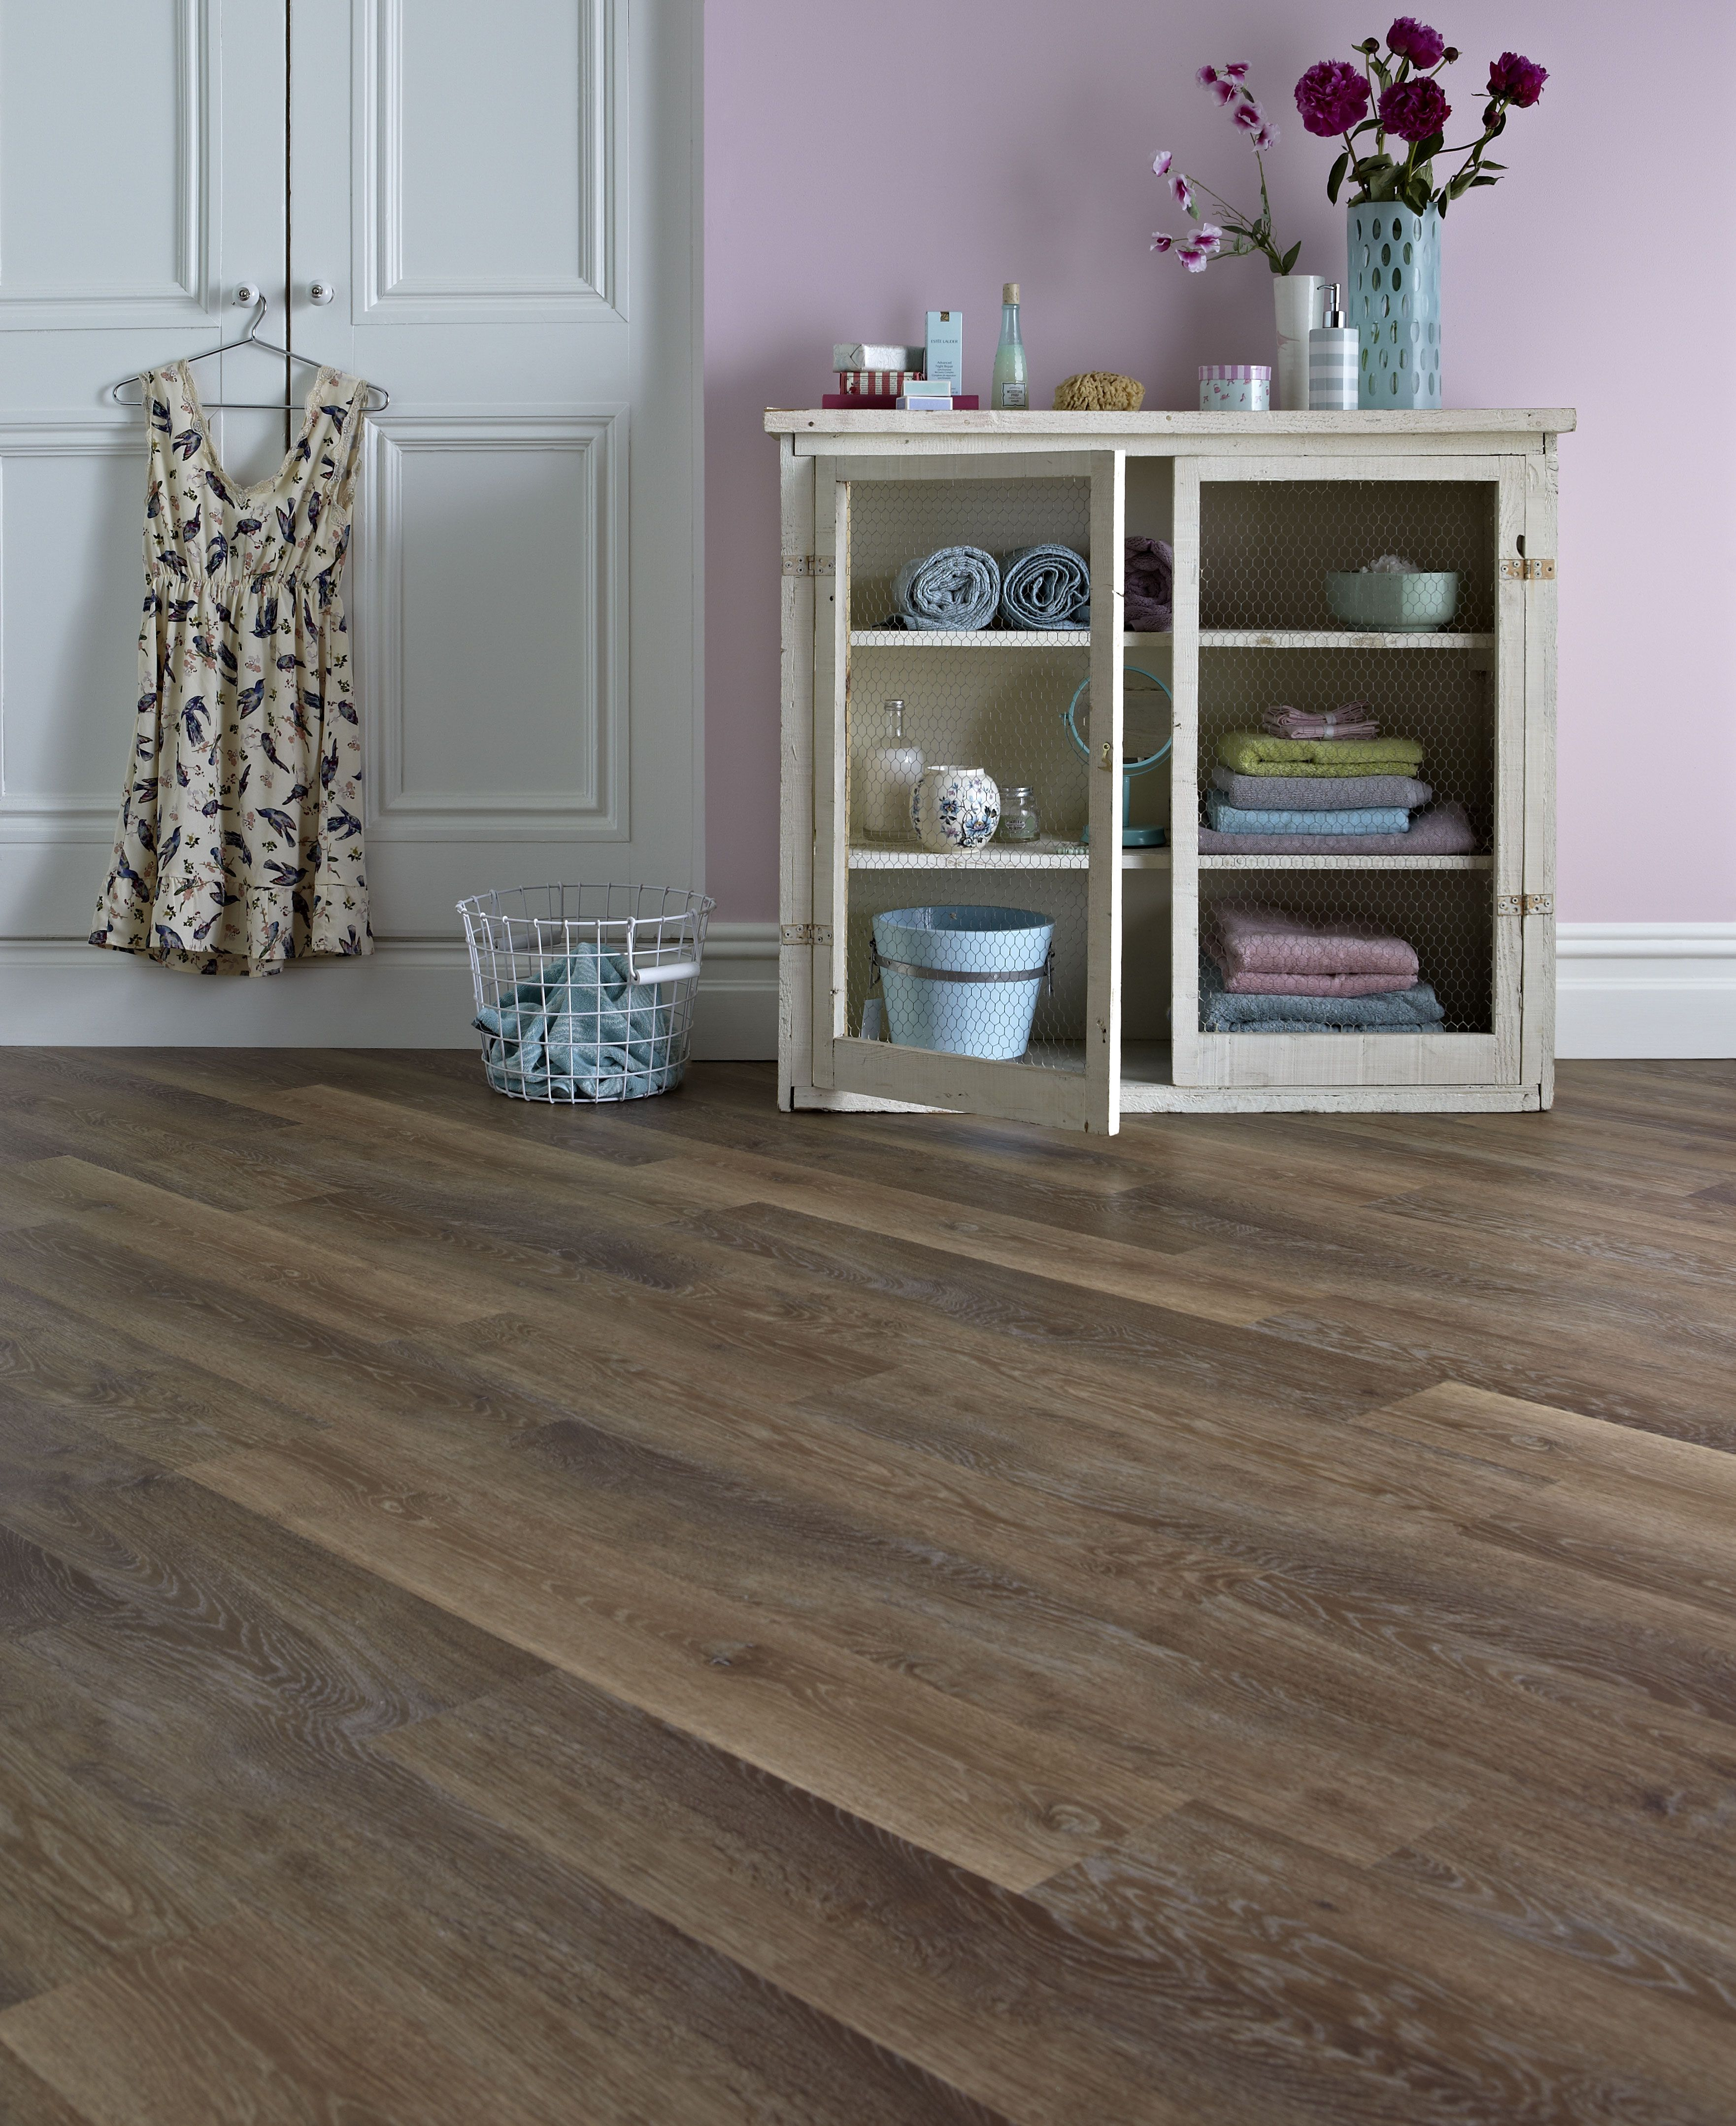 Mid limed Oak My floors Flooring, Oak, Home decor